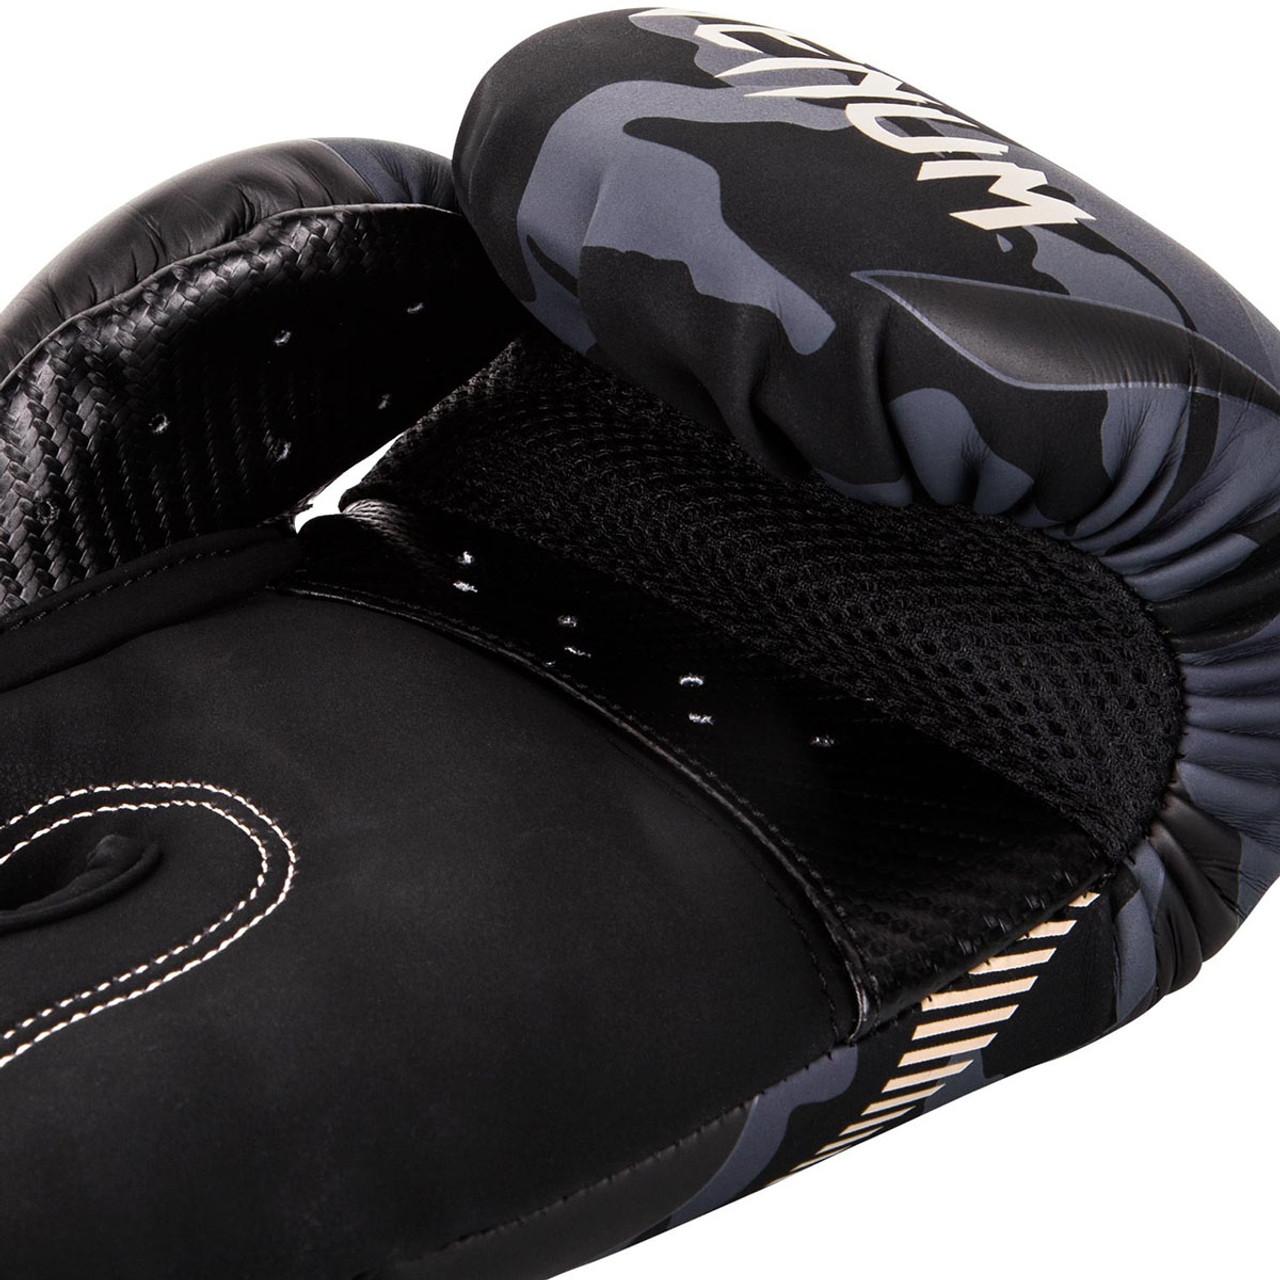 Venum Elite Boxing Gloves Navy Blue//White